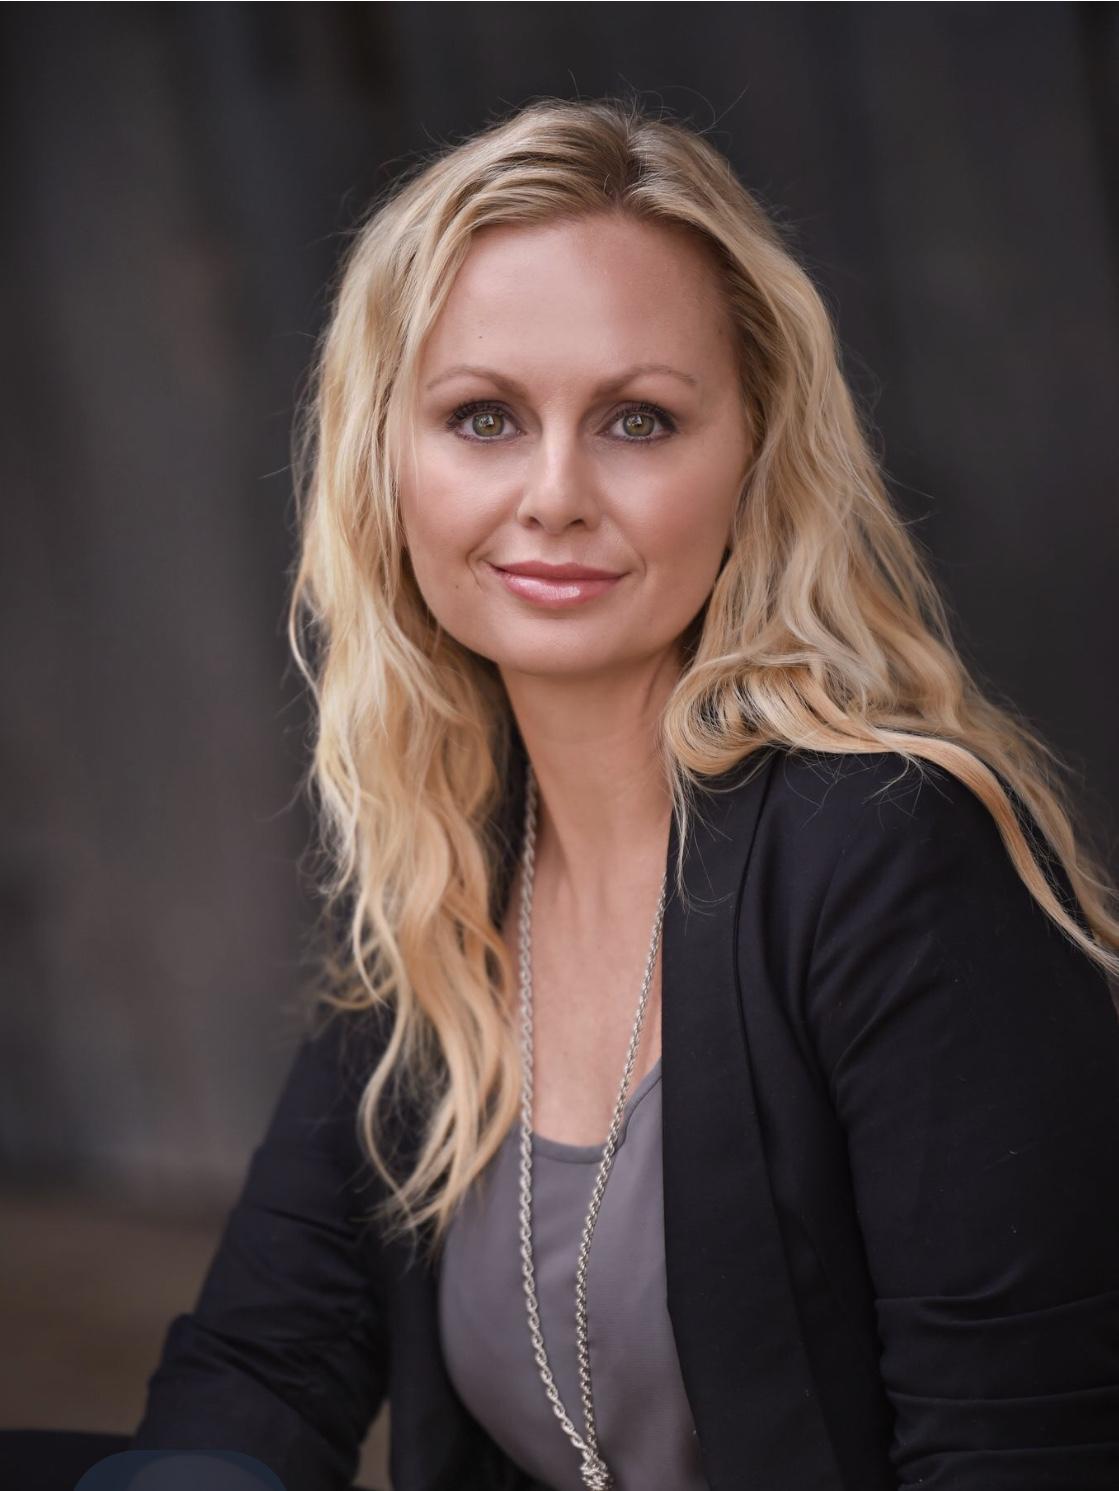 Danielle Roulet-Davy